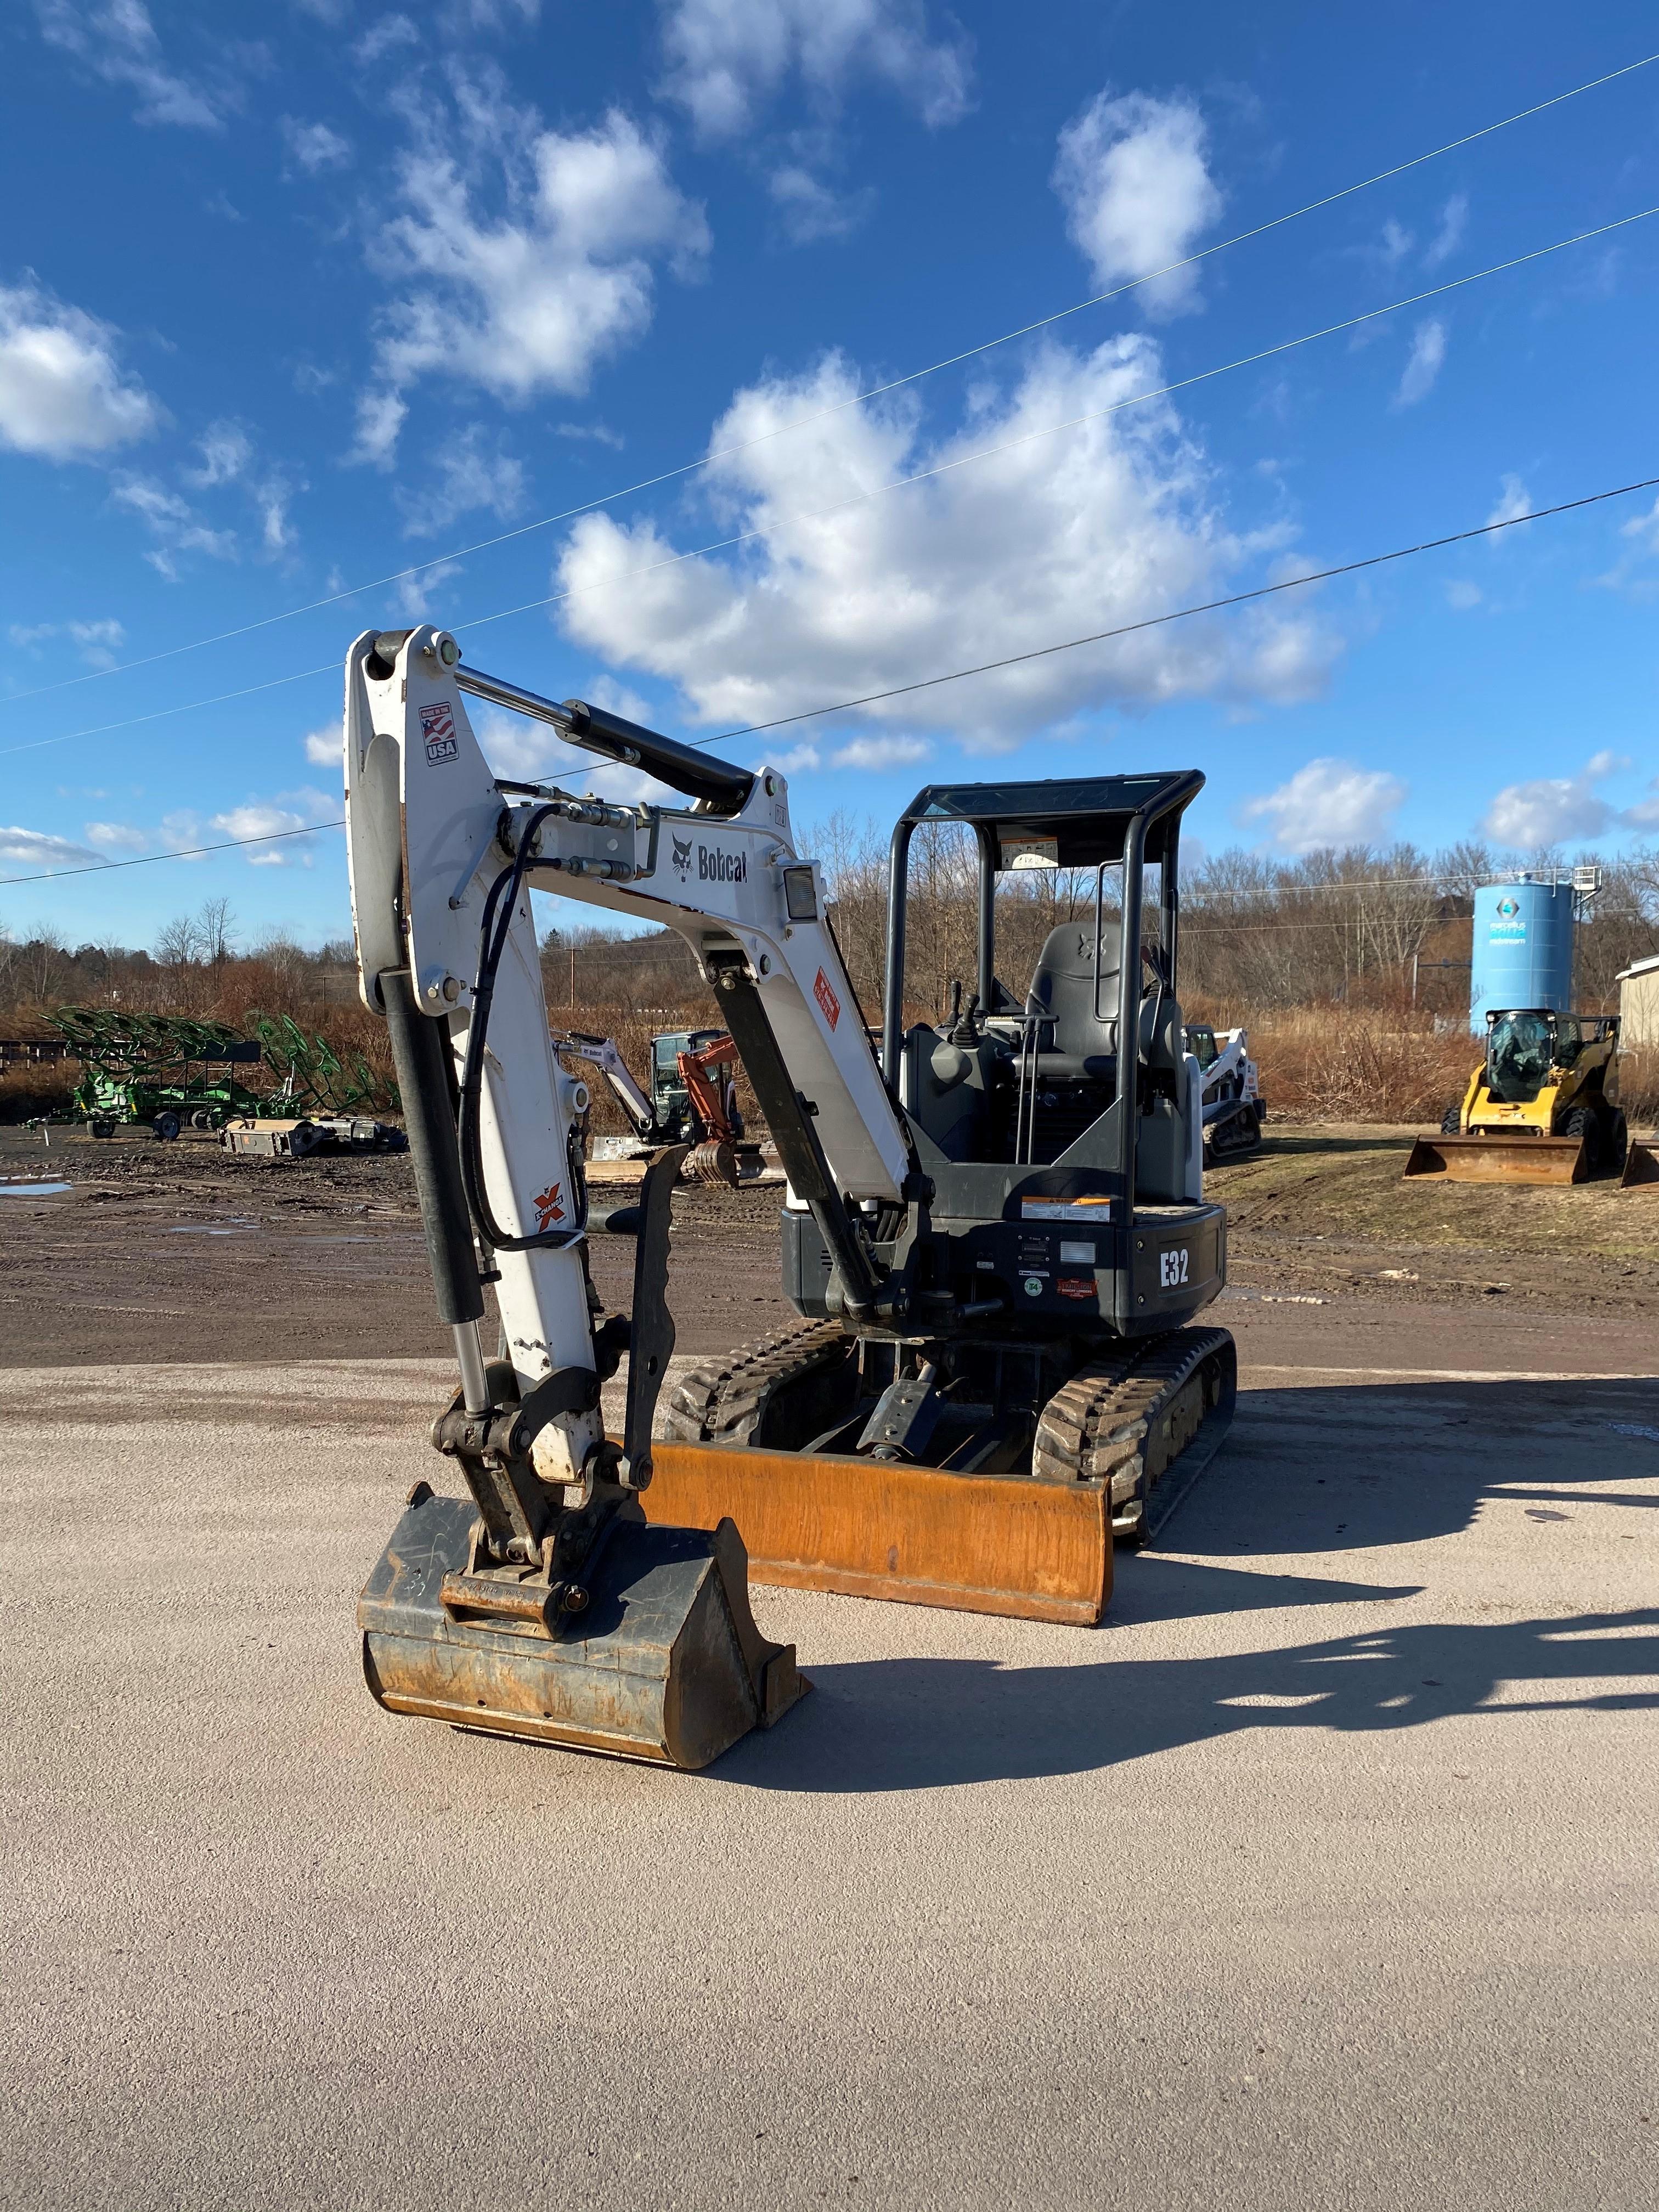 Used, 2014, Bobcat, E32, Excavators